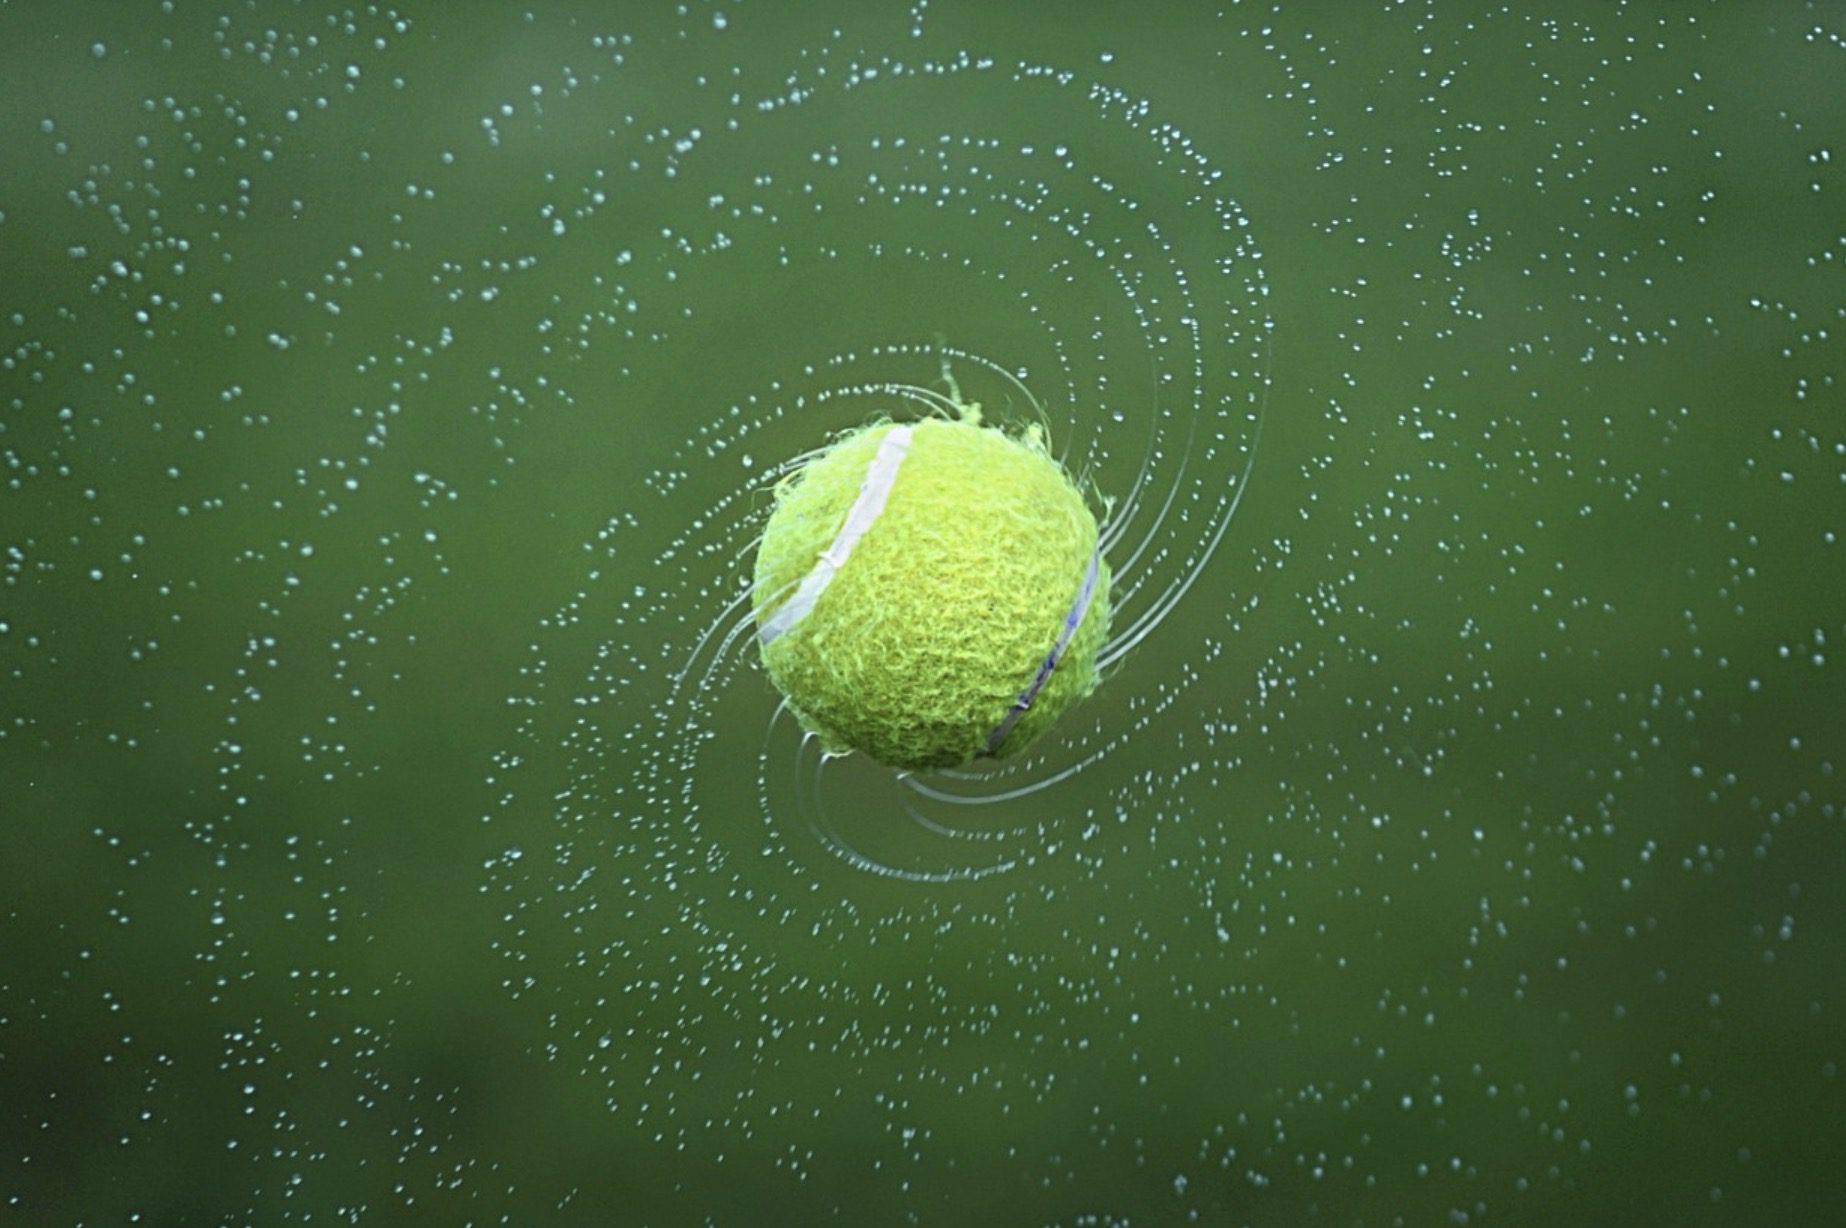 Une balle de tennis